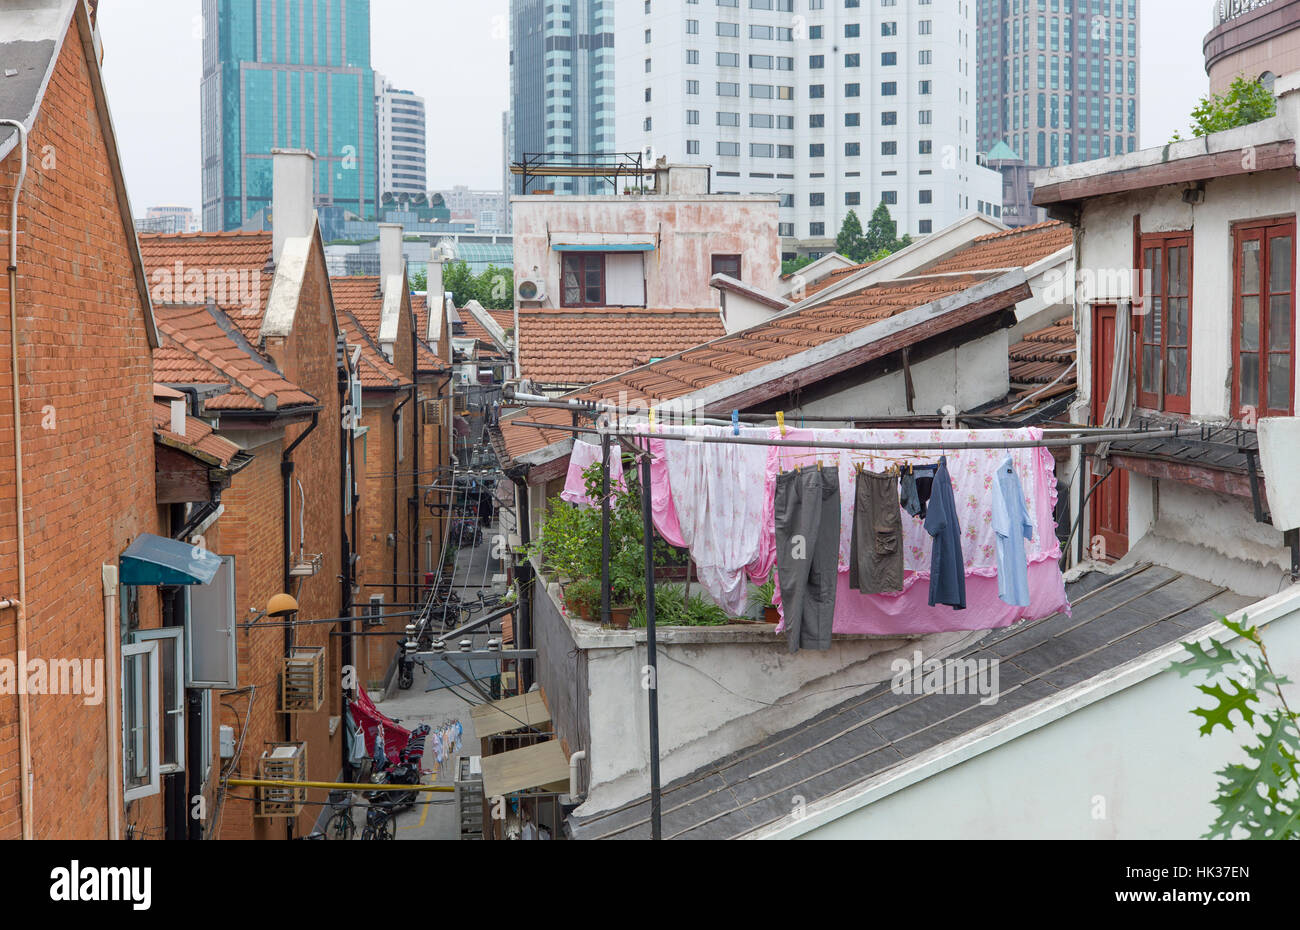 Washing drying in backyard of housing, Shanghai, China - Stock Image